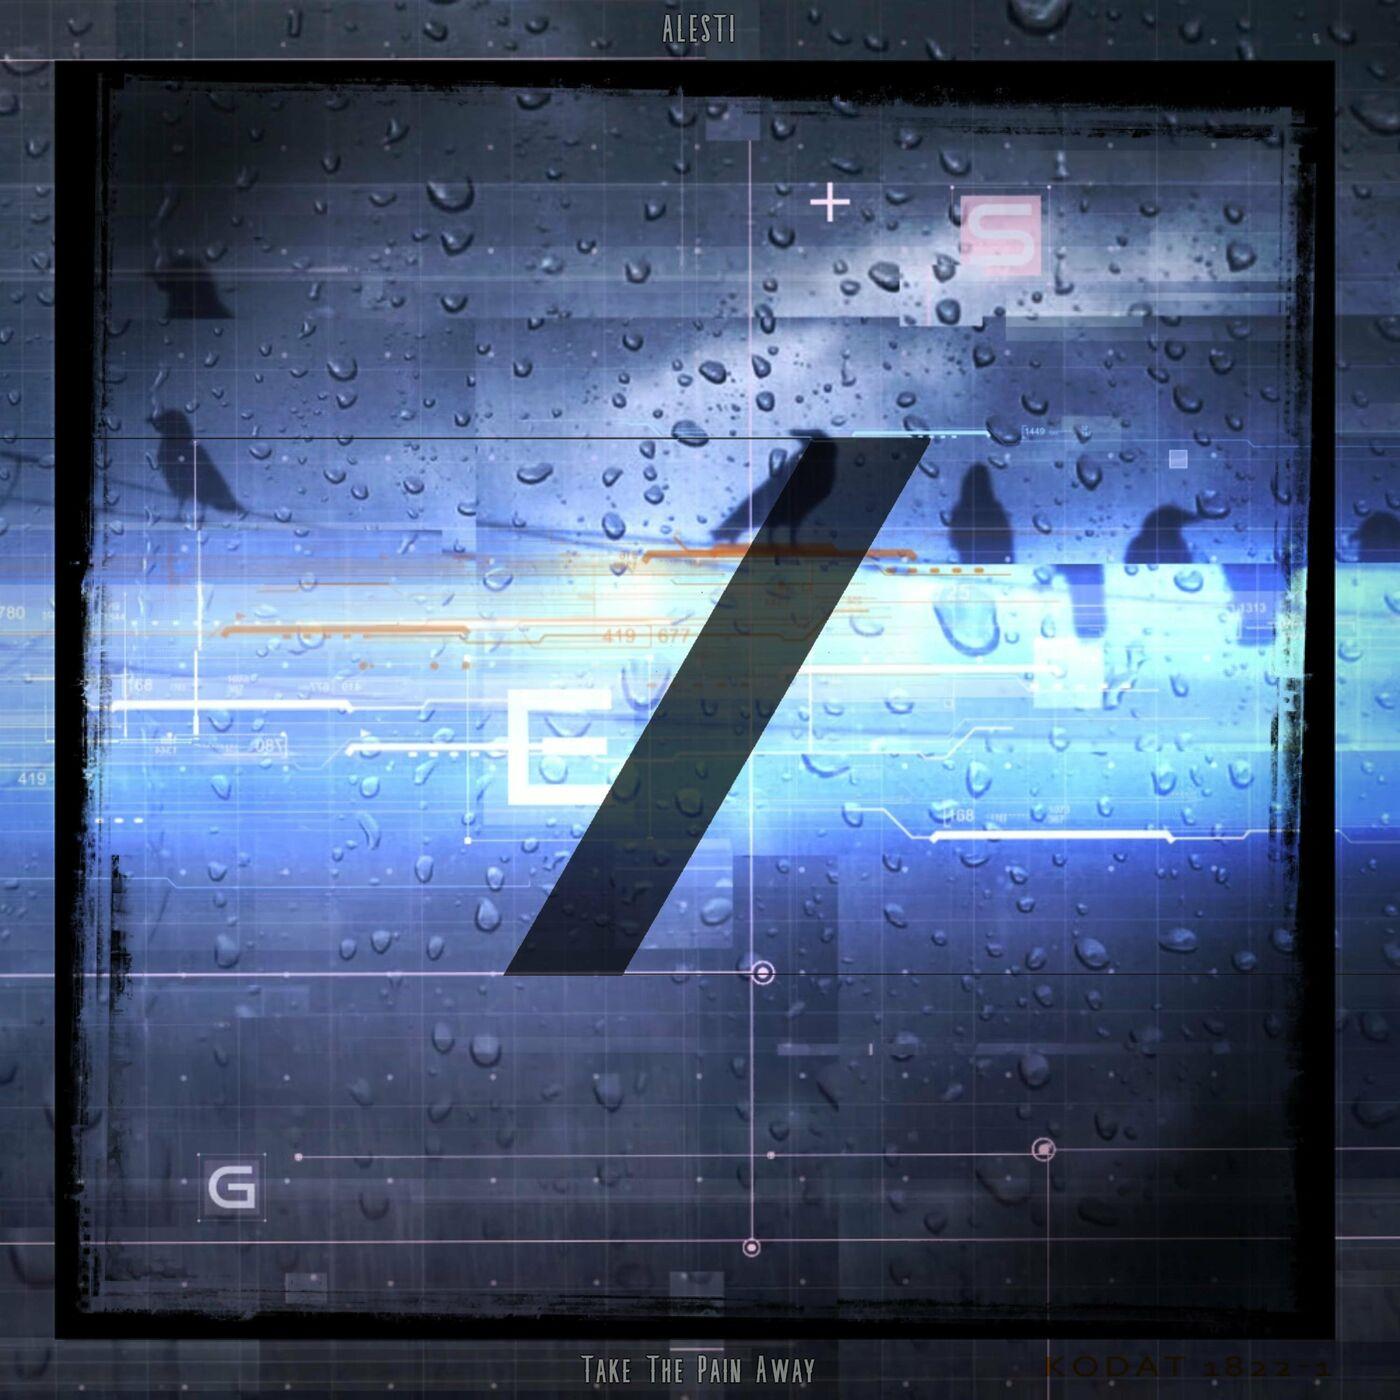 ALESTI - Take the Pain Away [single] (2020)